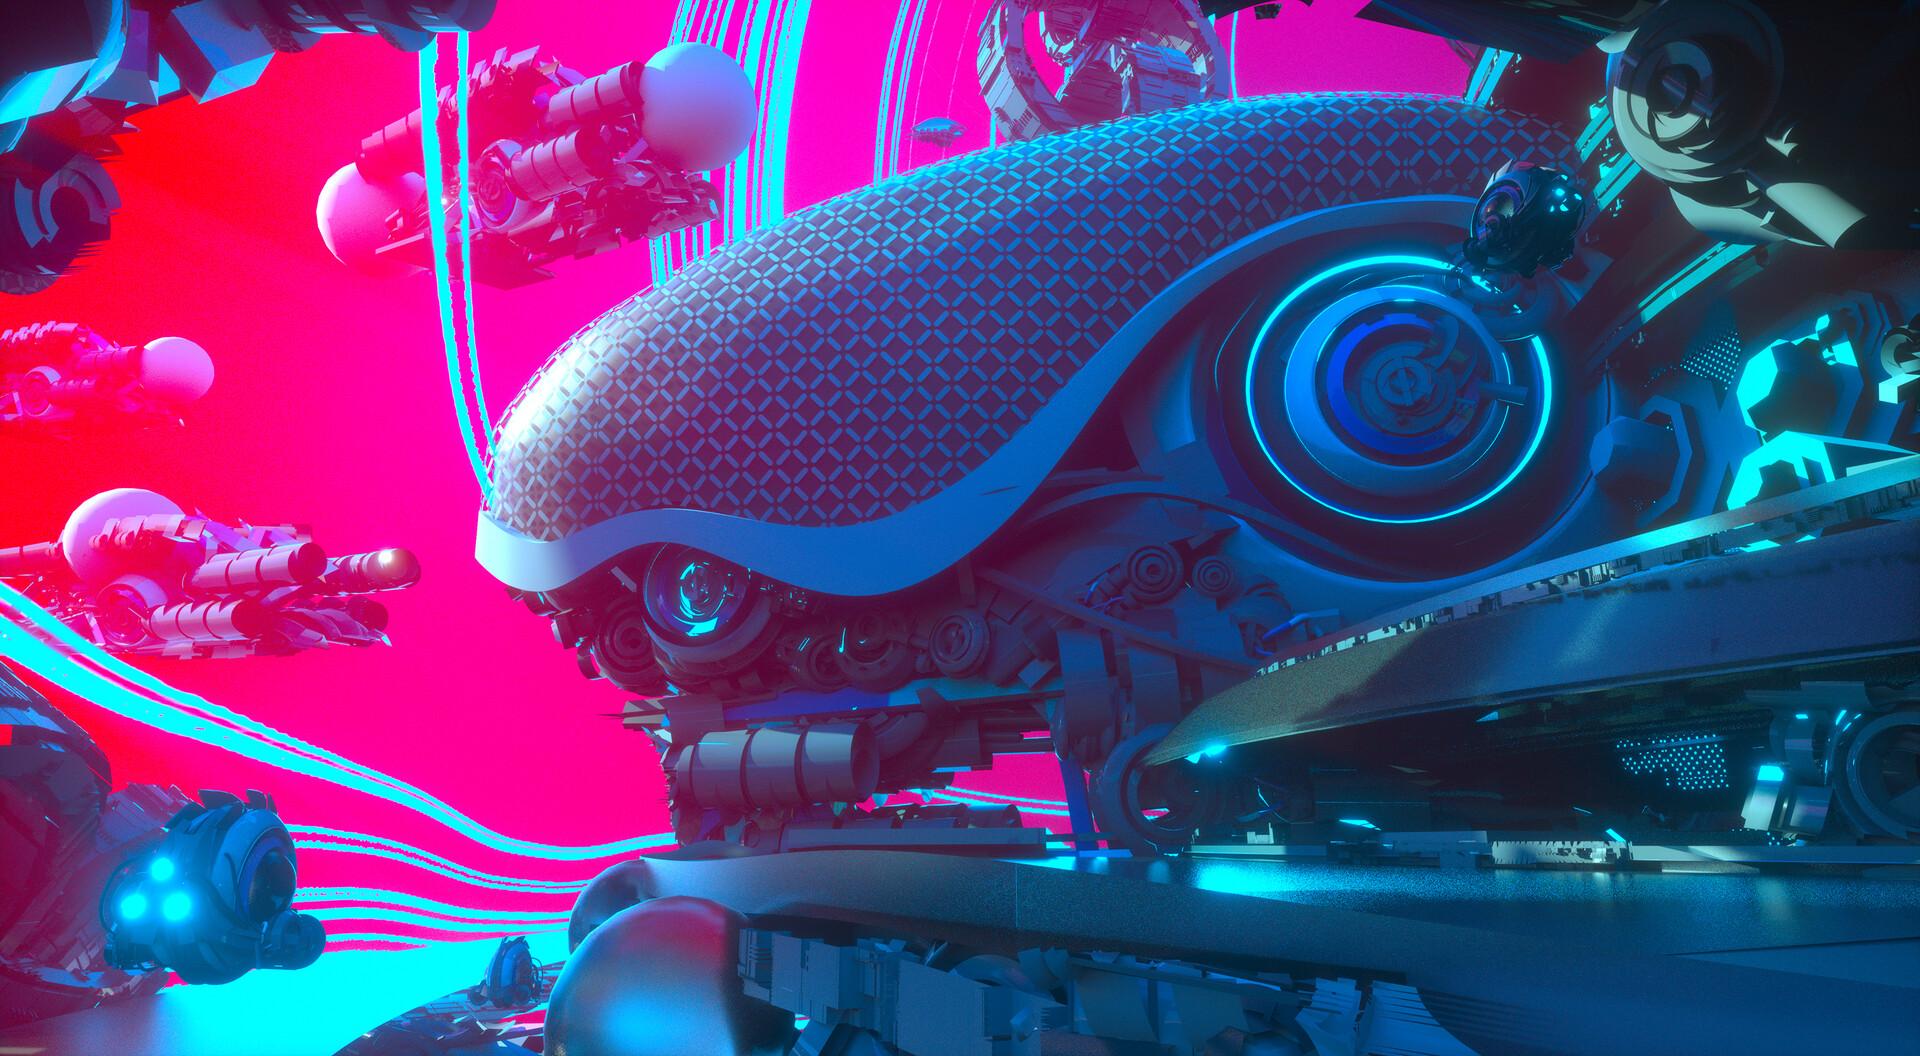 Leon tukker spacepirate city3d